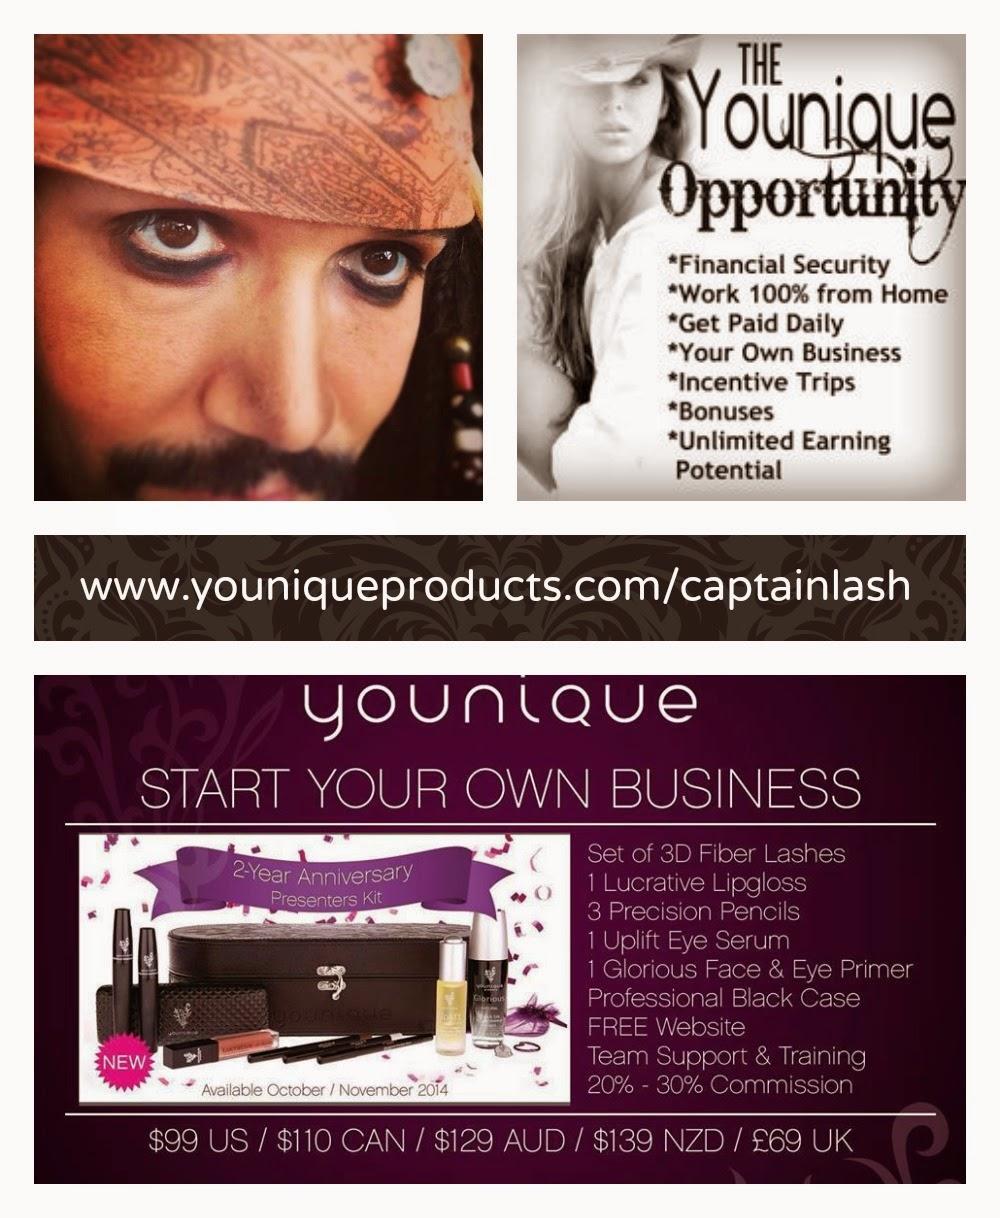 https://www.youniqueproducts.com/captainlash/business/presenterinfo